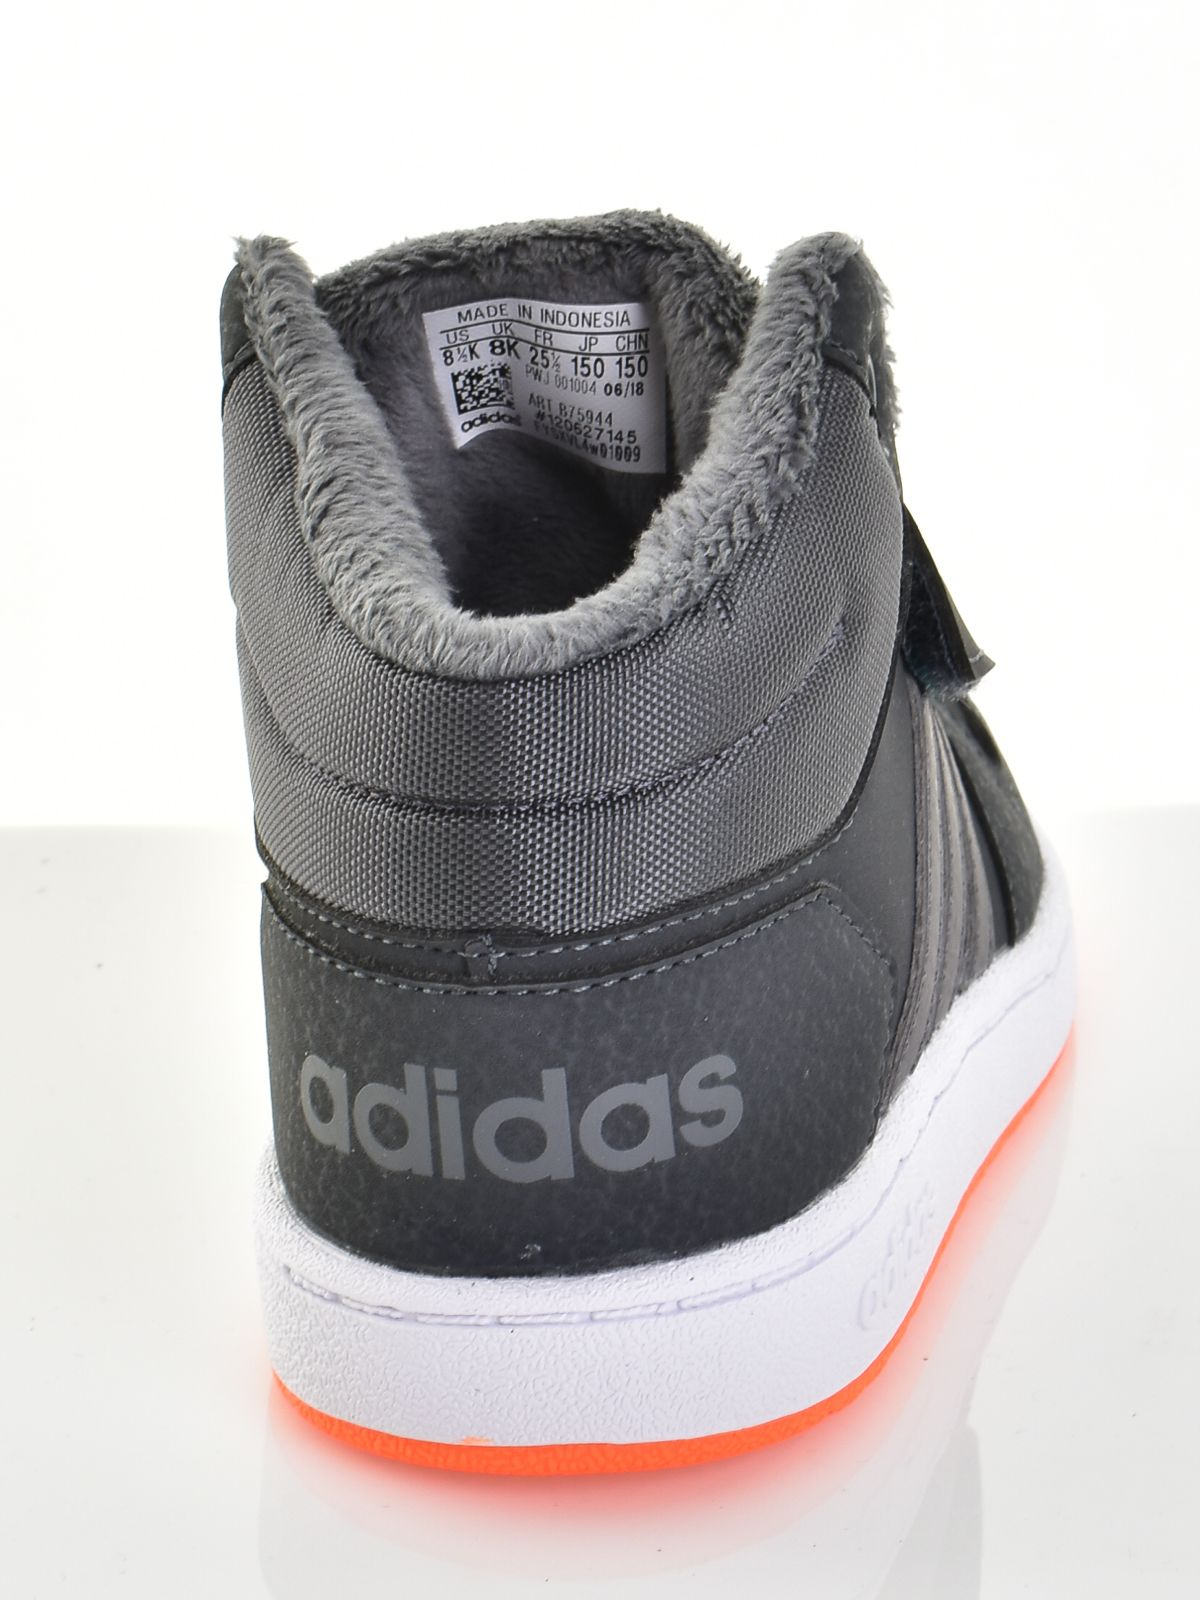 ... Adidas bébi fiú magasszárú cipő HOOPS MID 2.0 I ... c828af30be